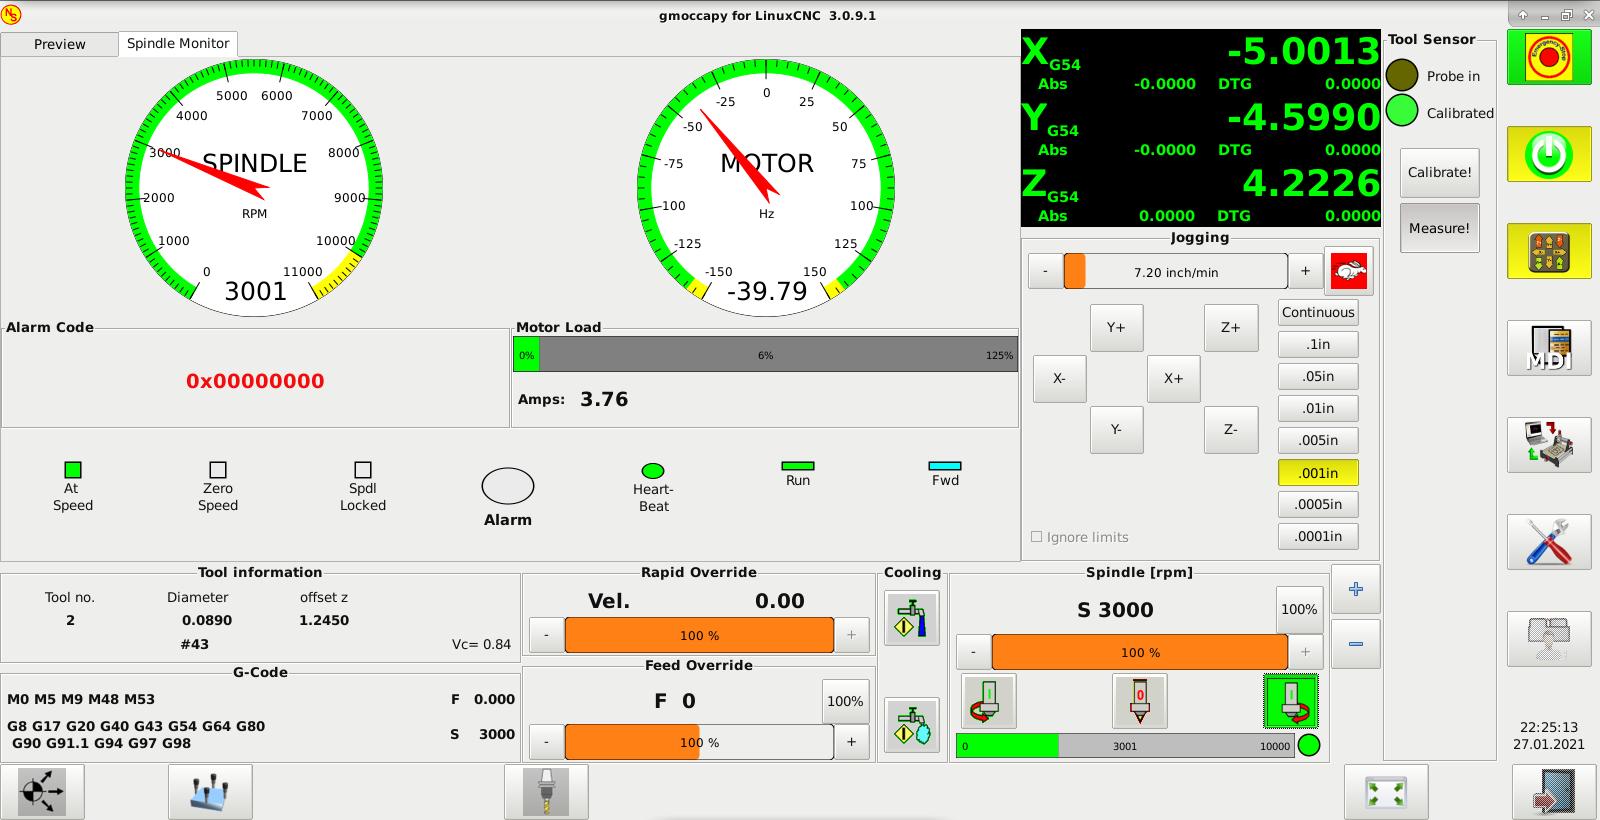 Screenshot_2021-01-27_22-25-16_2021-01-28.png